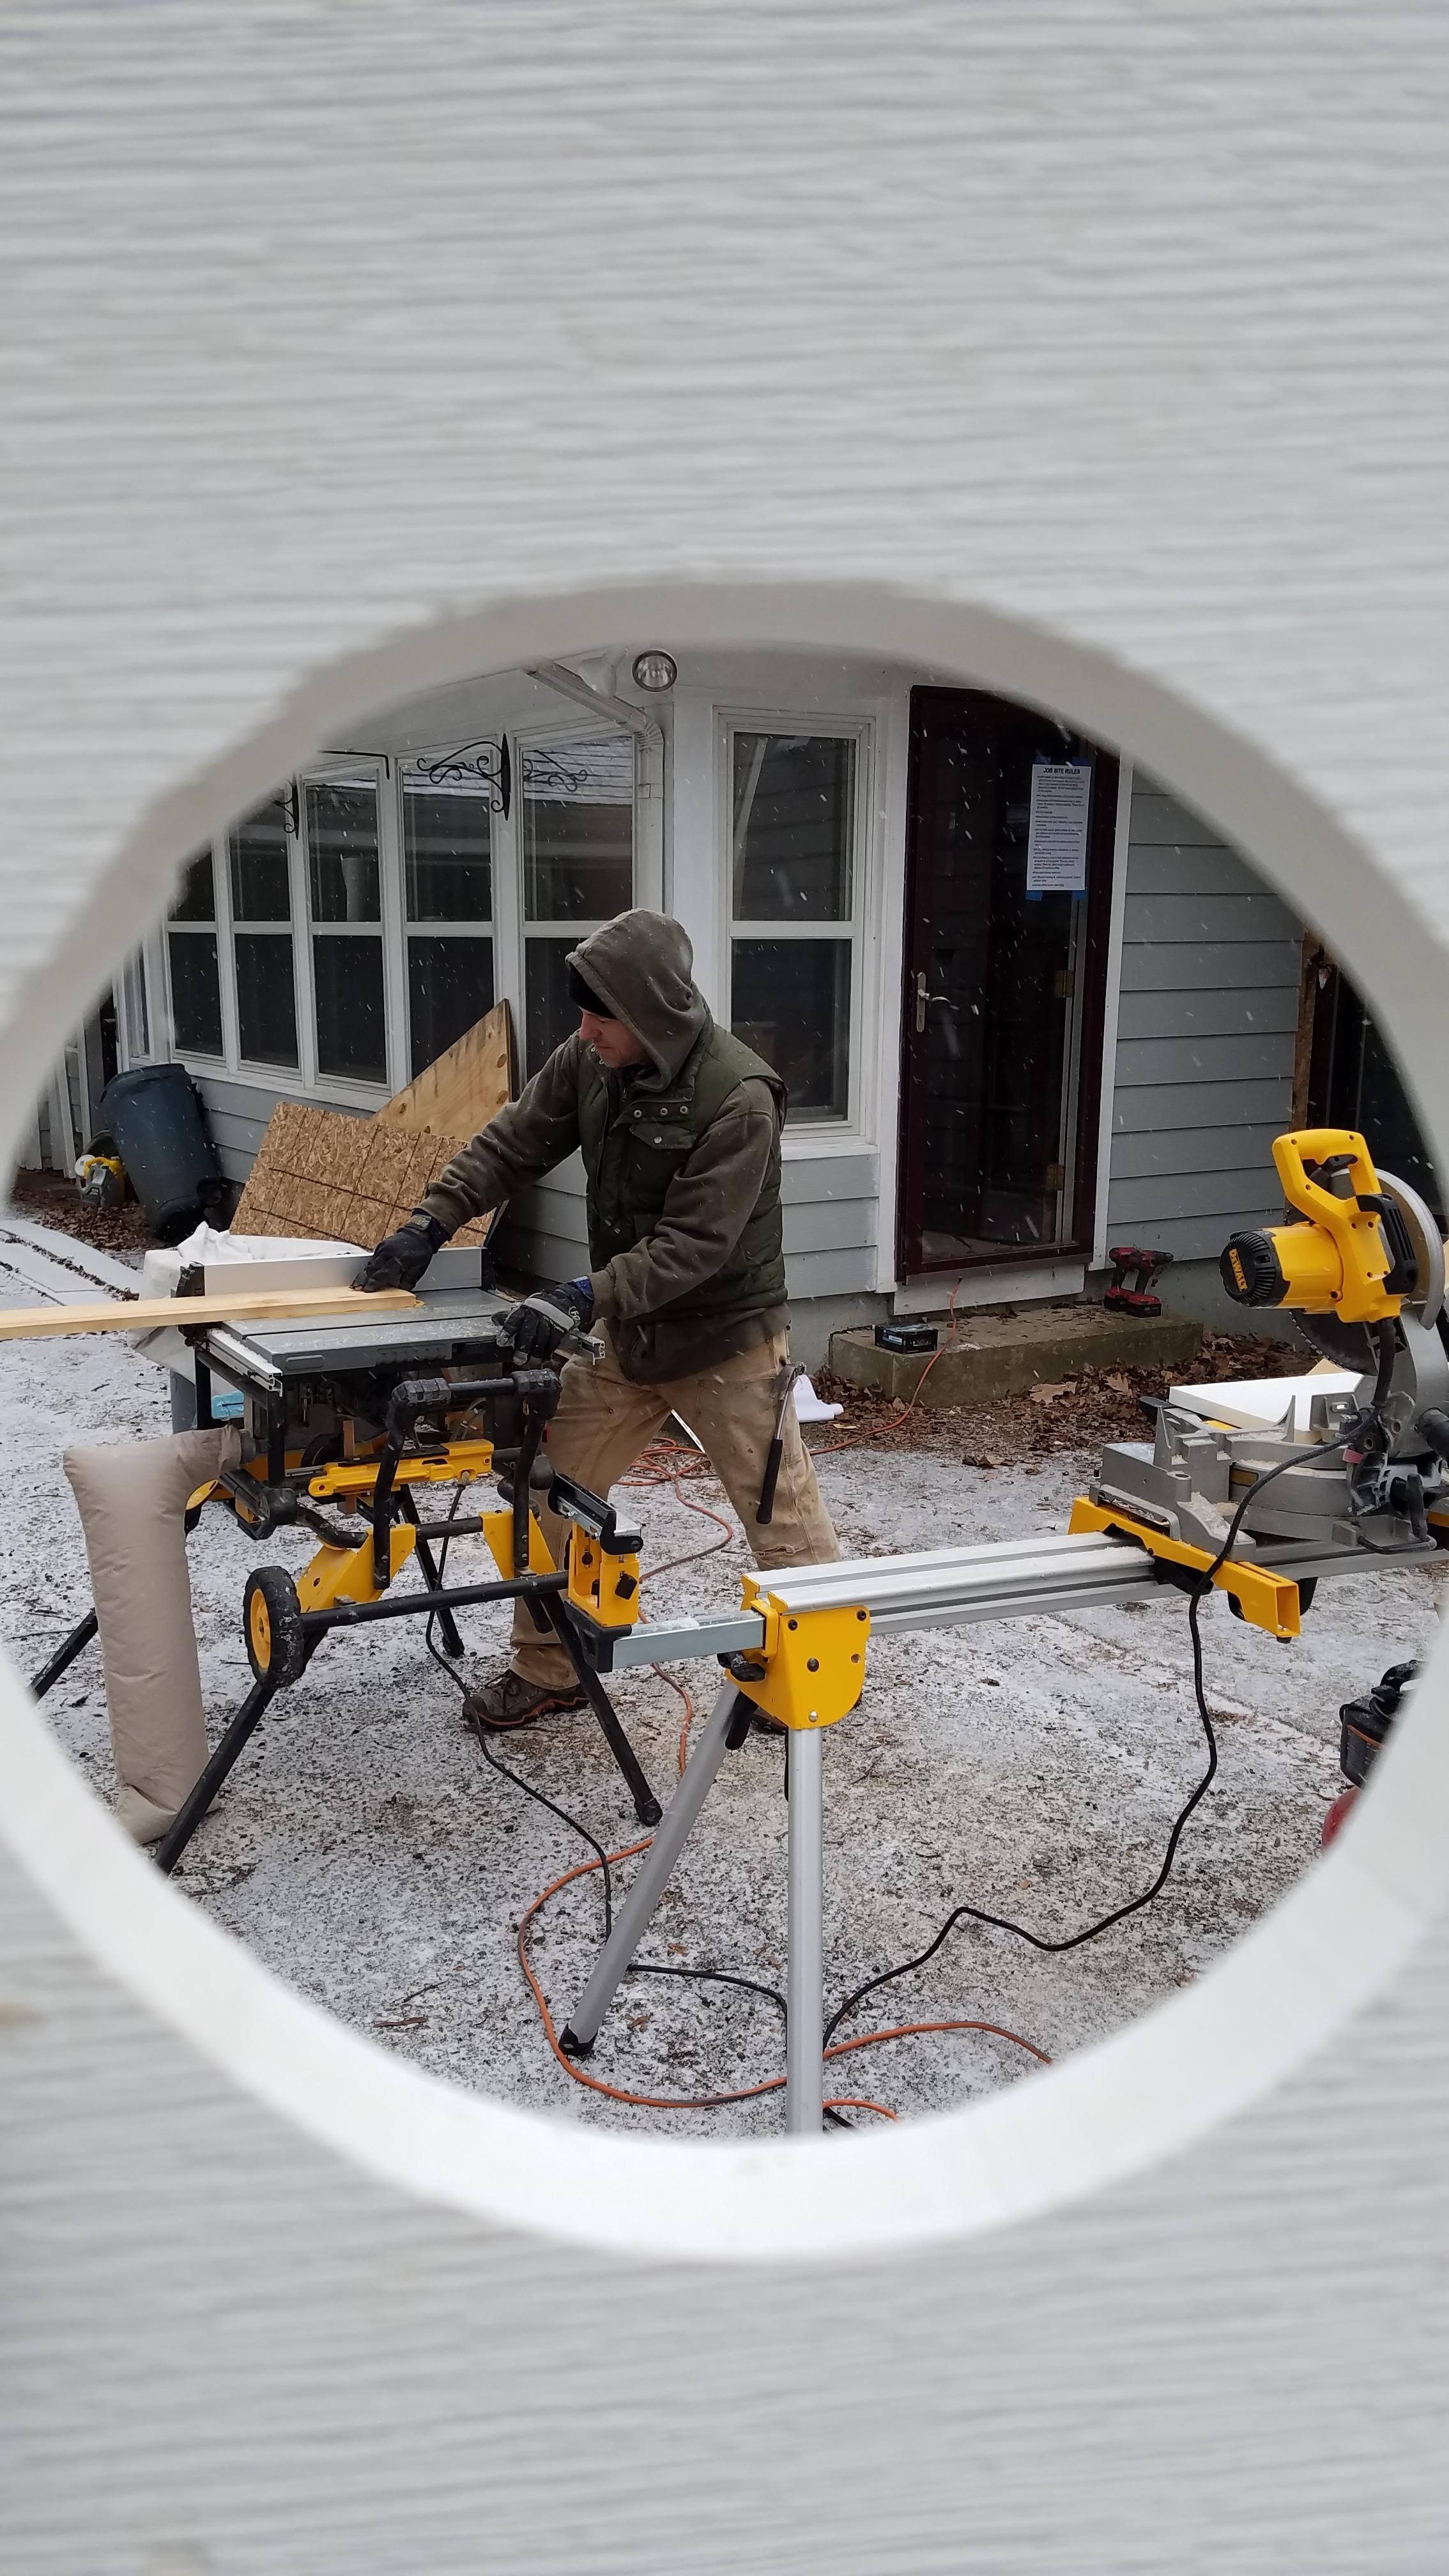 Carpenter Brian Schmidt